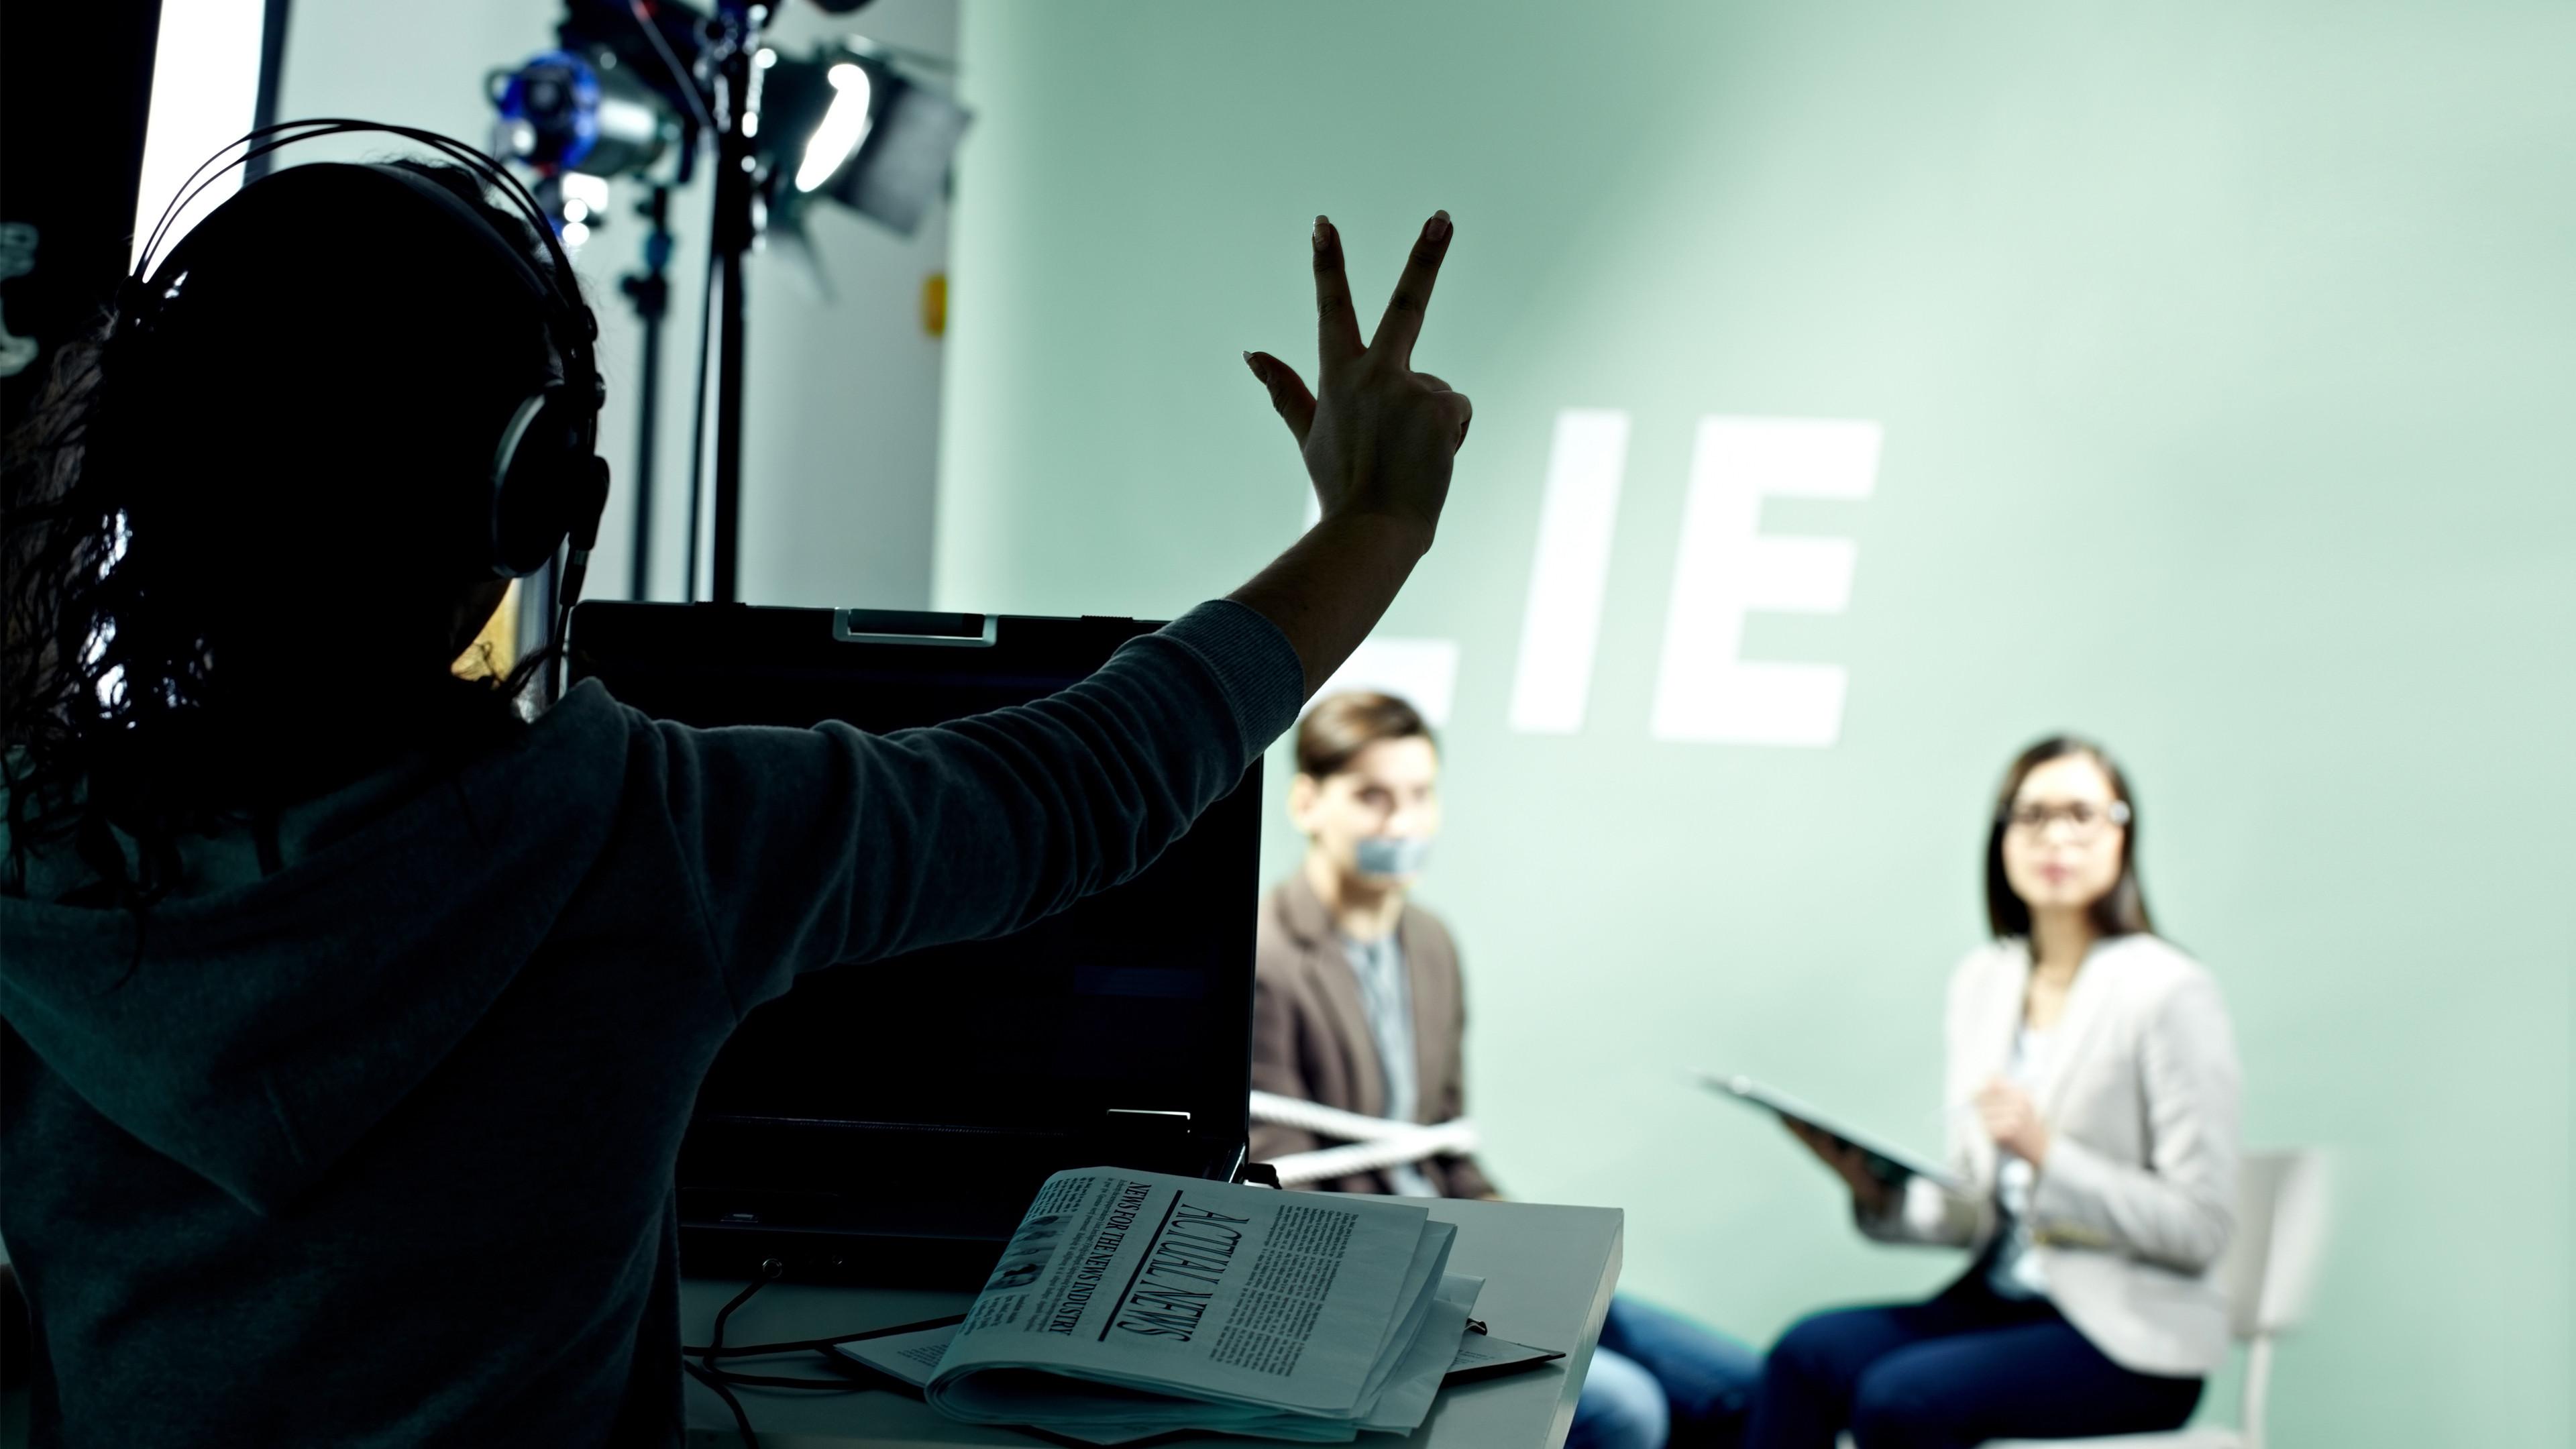 Director, DoP, Camera Assist, Editor